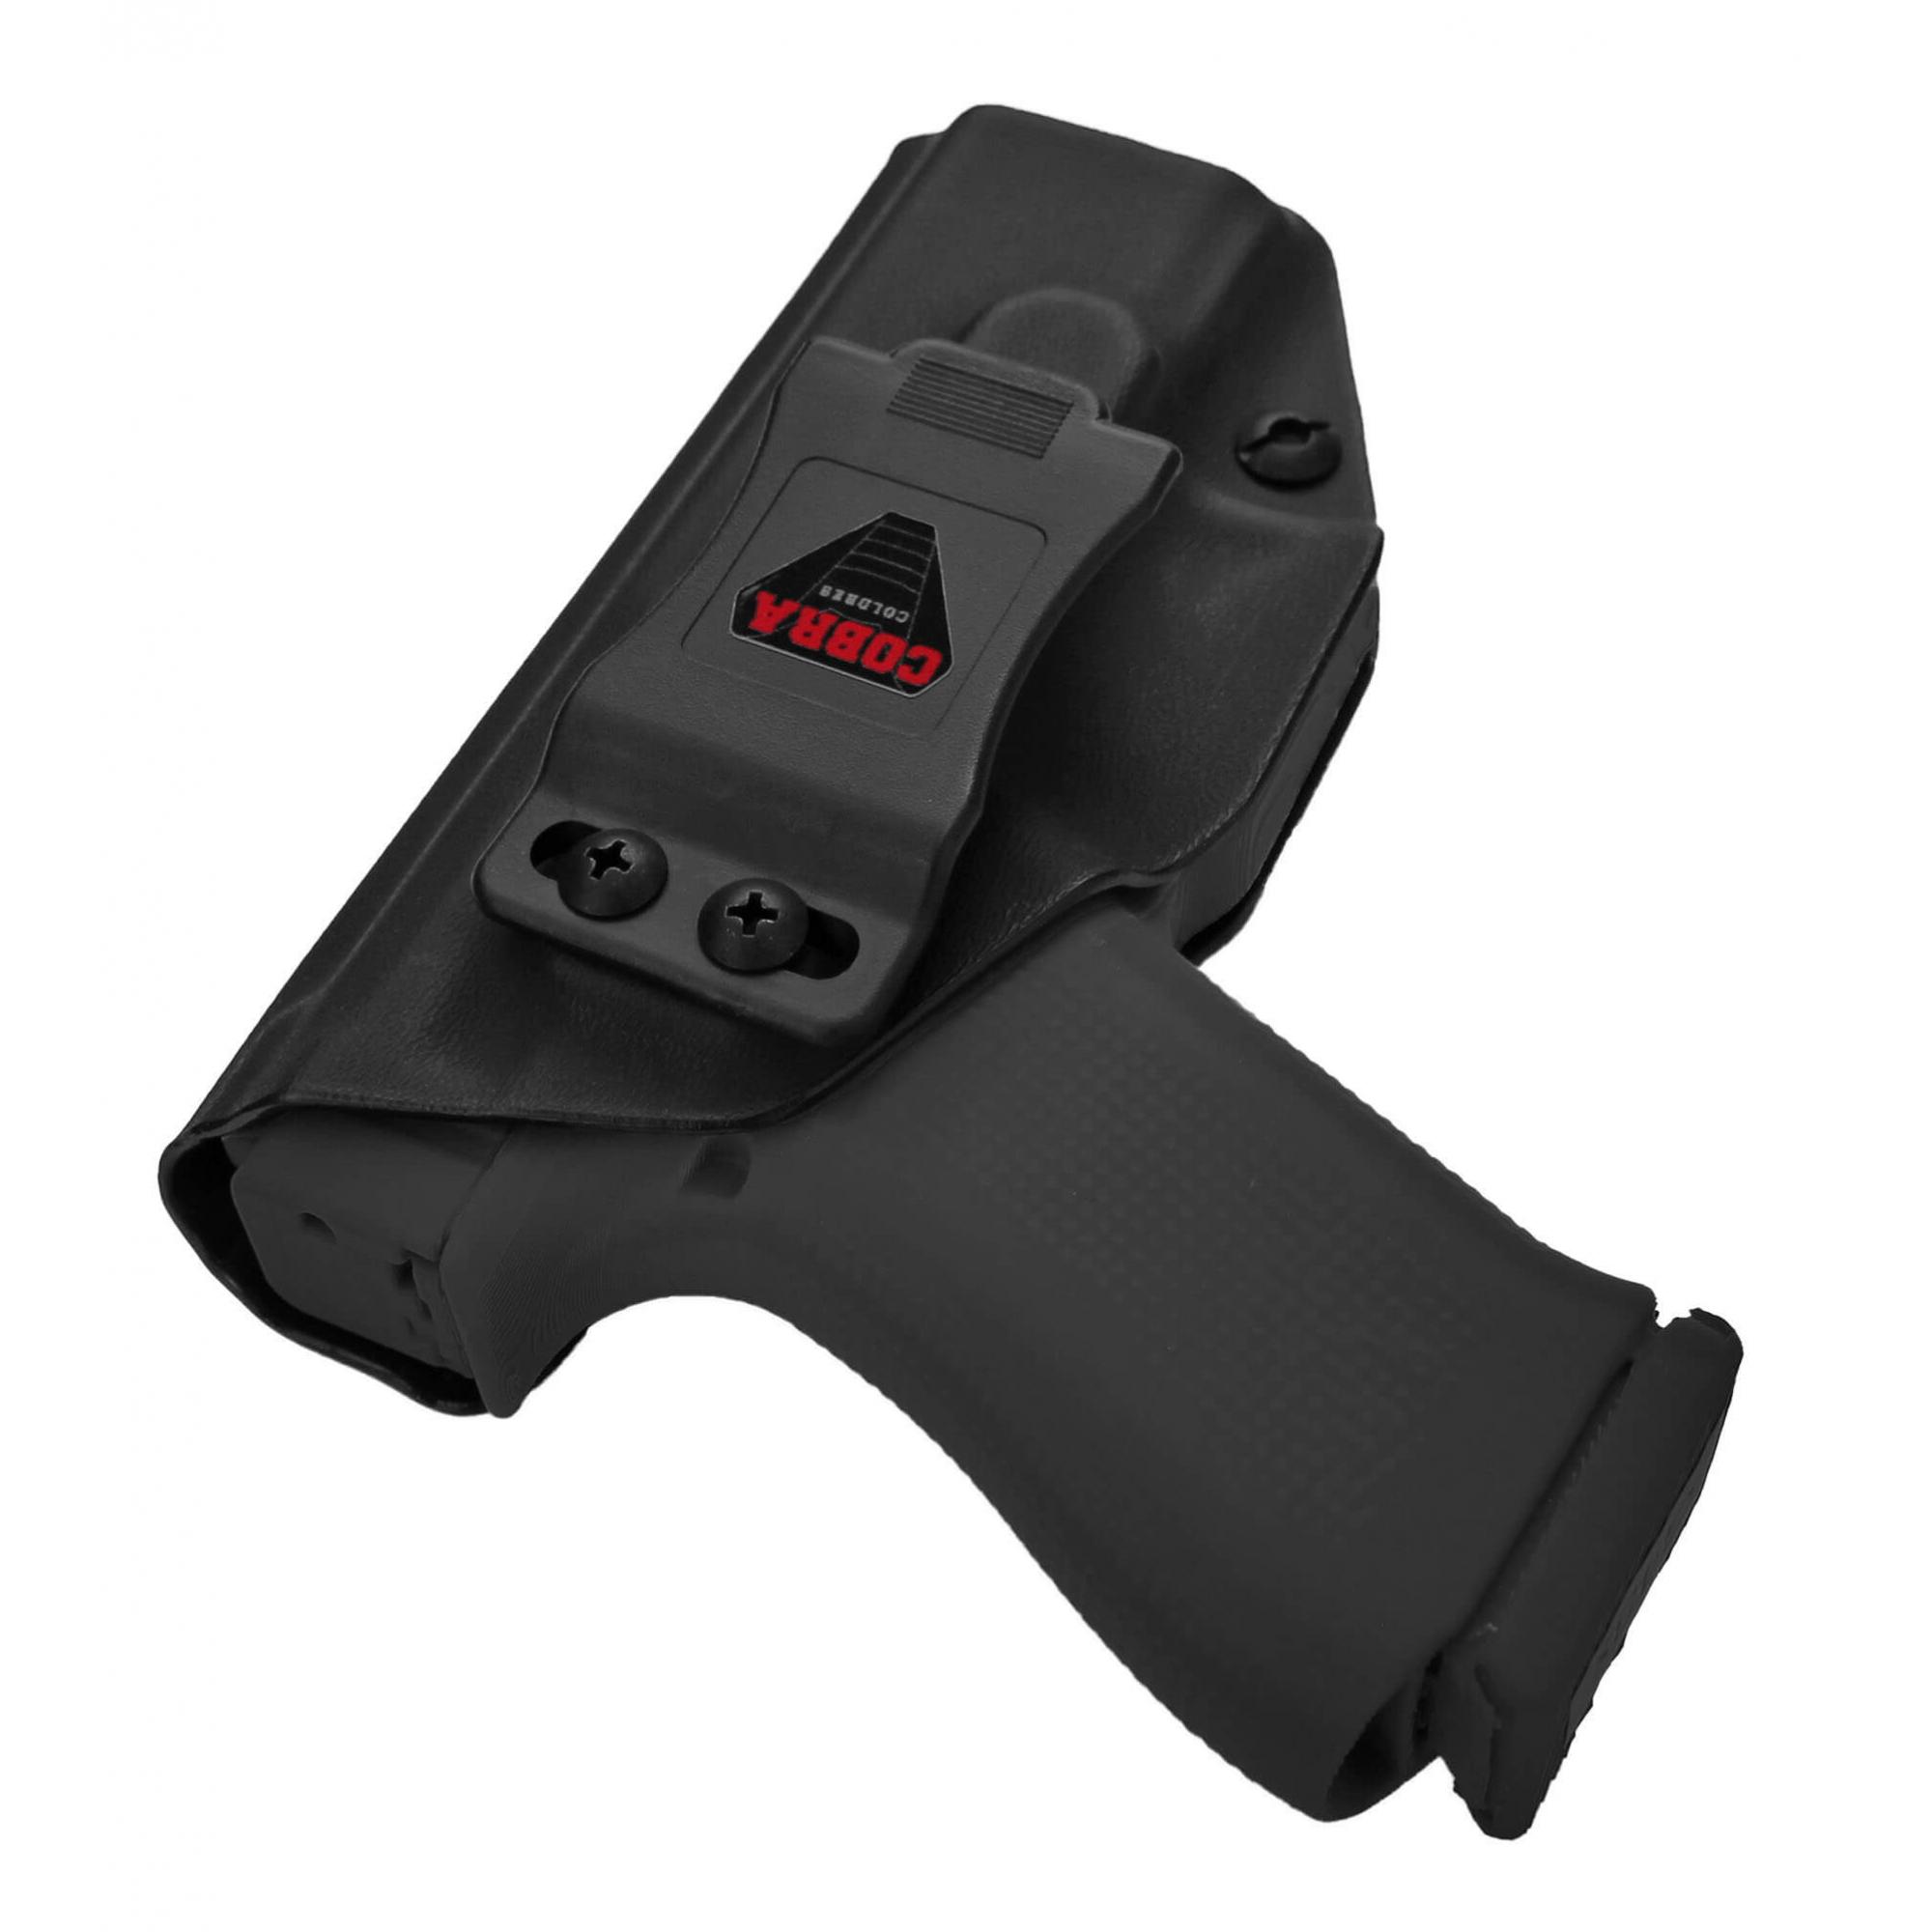 Coldre Kydex [G43] [G43x] [G43x MoS] - Glock - Saque Rápido Velado Kydex® 080